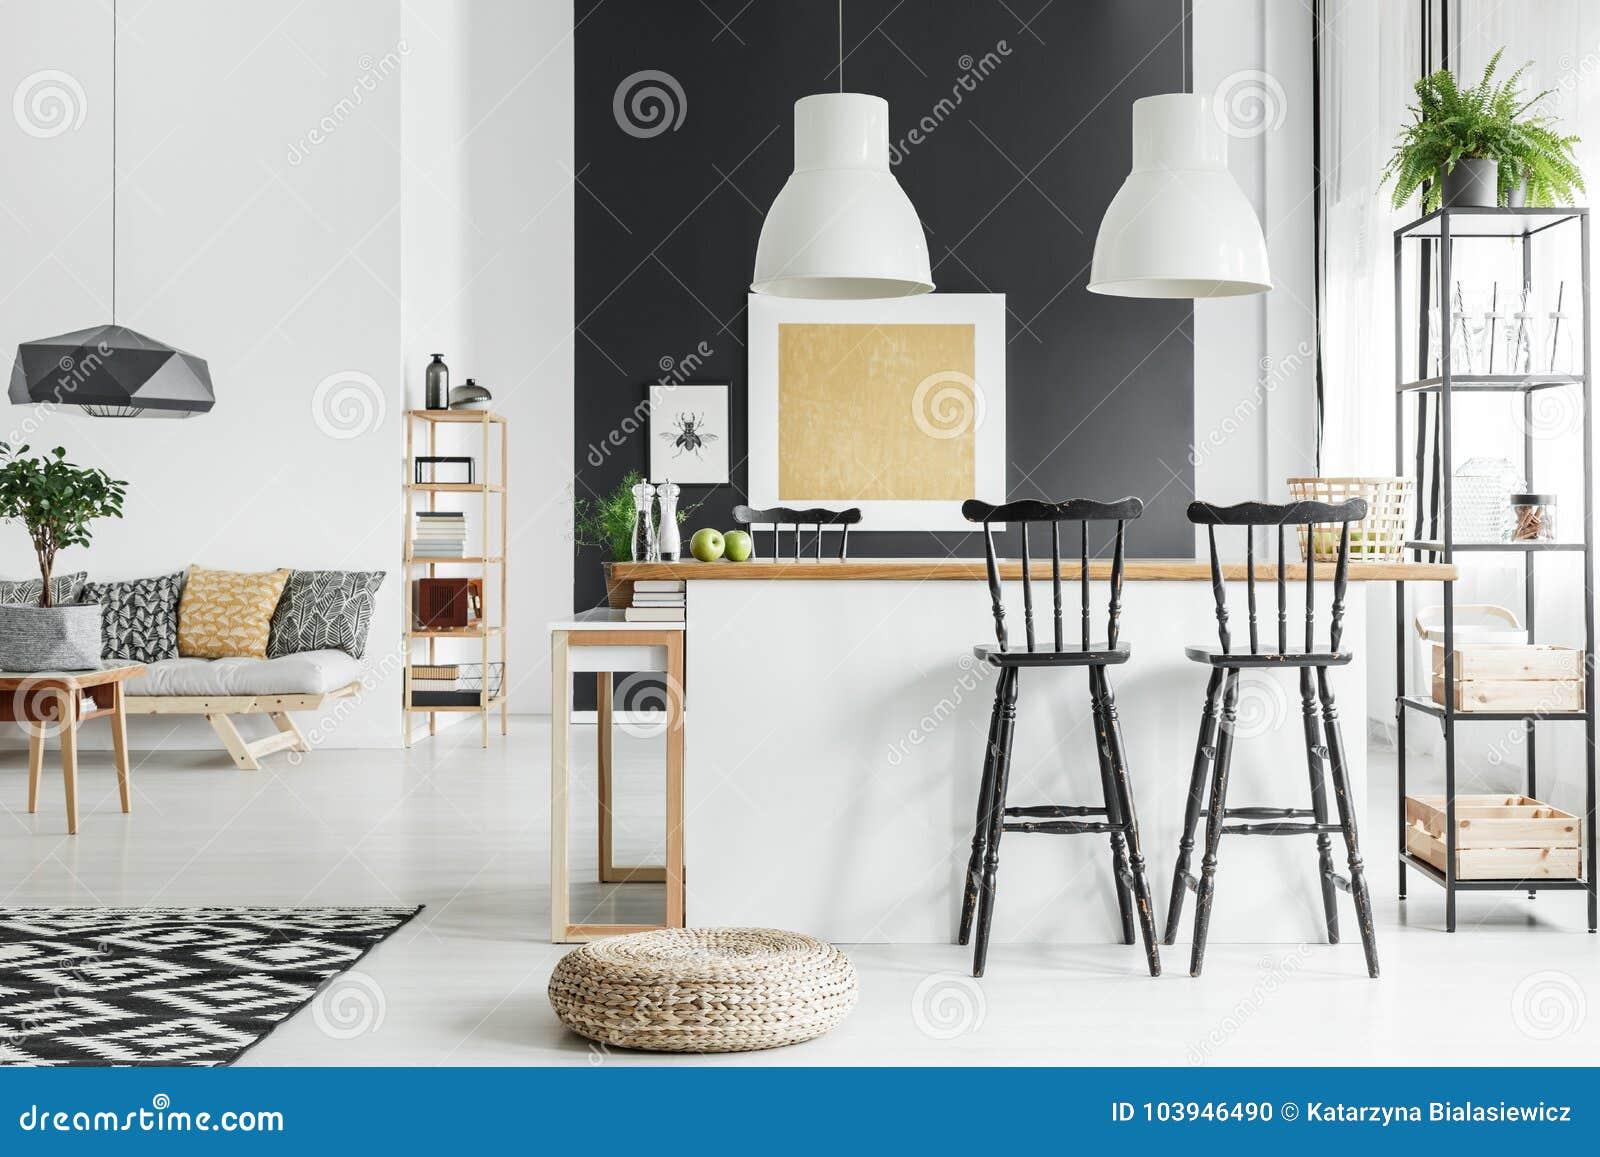 Salon rustique spacieux photo stock. Image du diner - 103946490